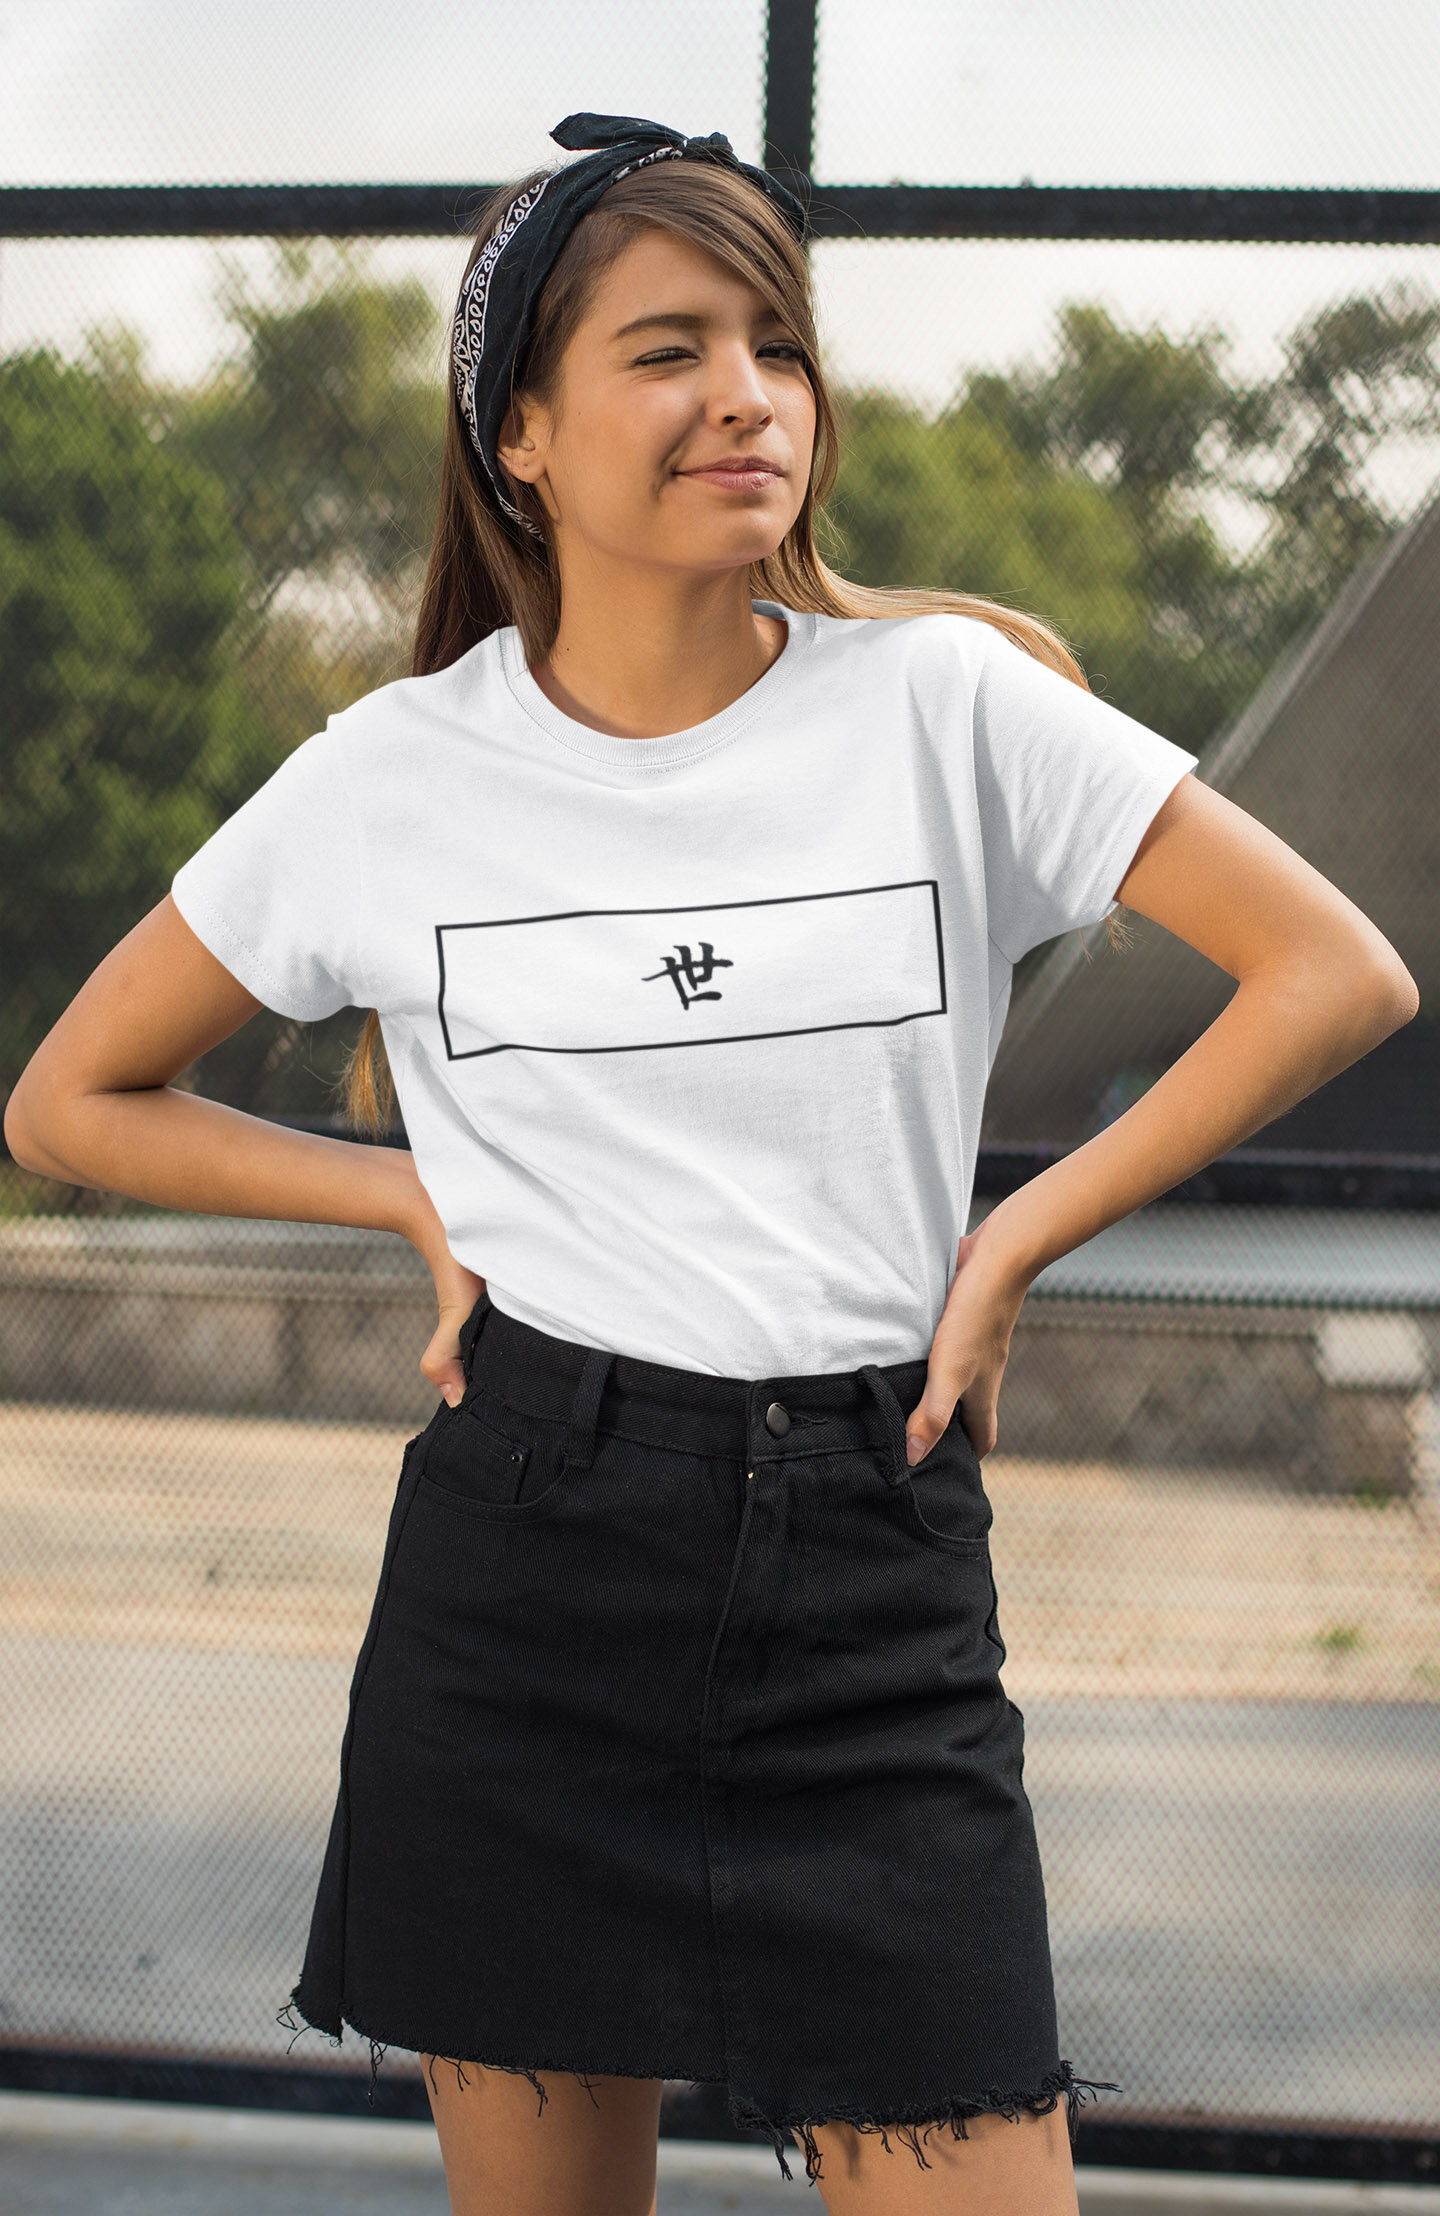 t-shirt-mockup-of-a-woman-with-a-headband-winking-at-the-camera-27332.jpg